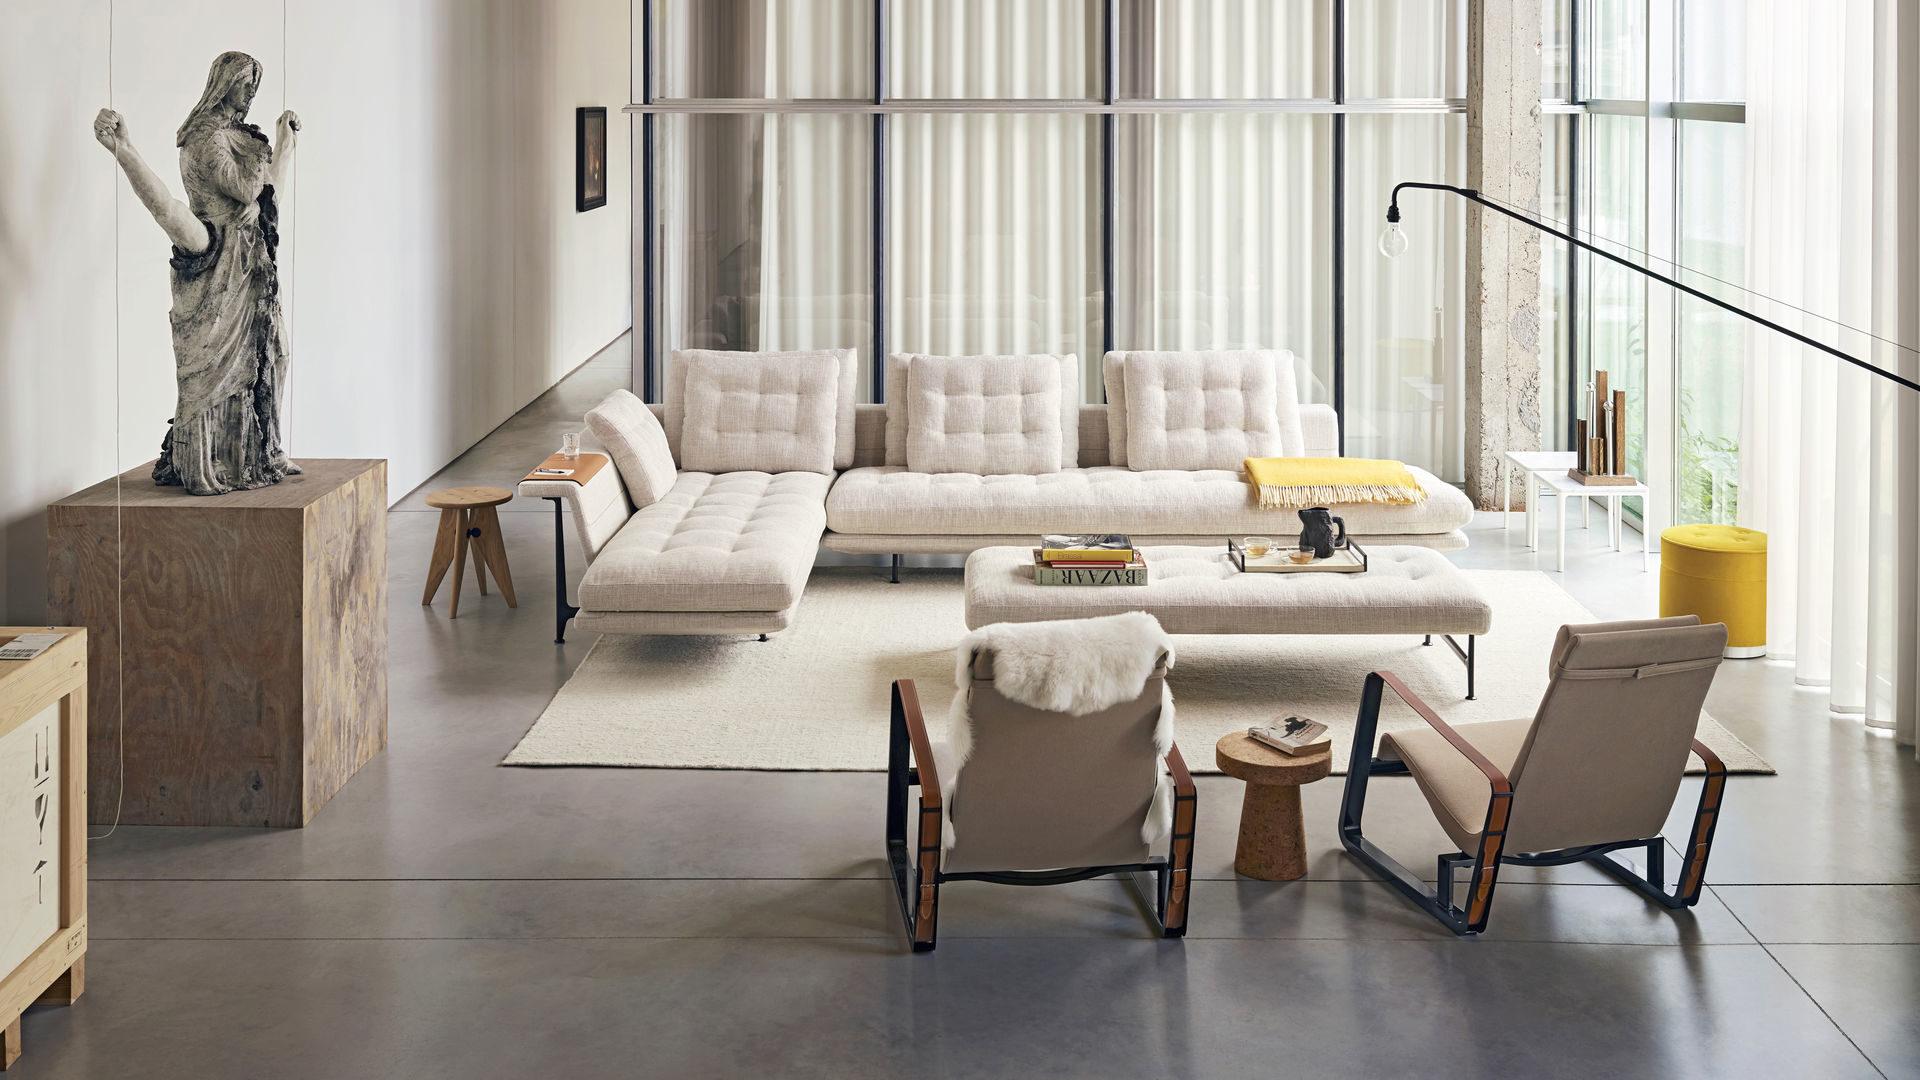 Grand Sofà Bench - Antonio Citterio